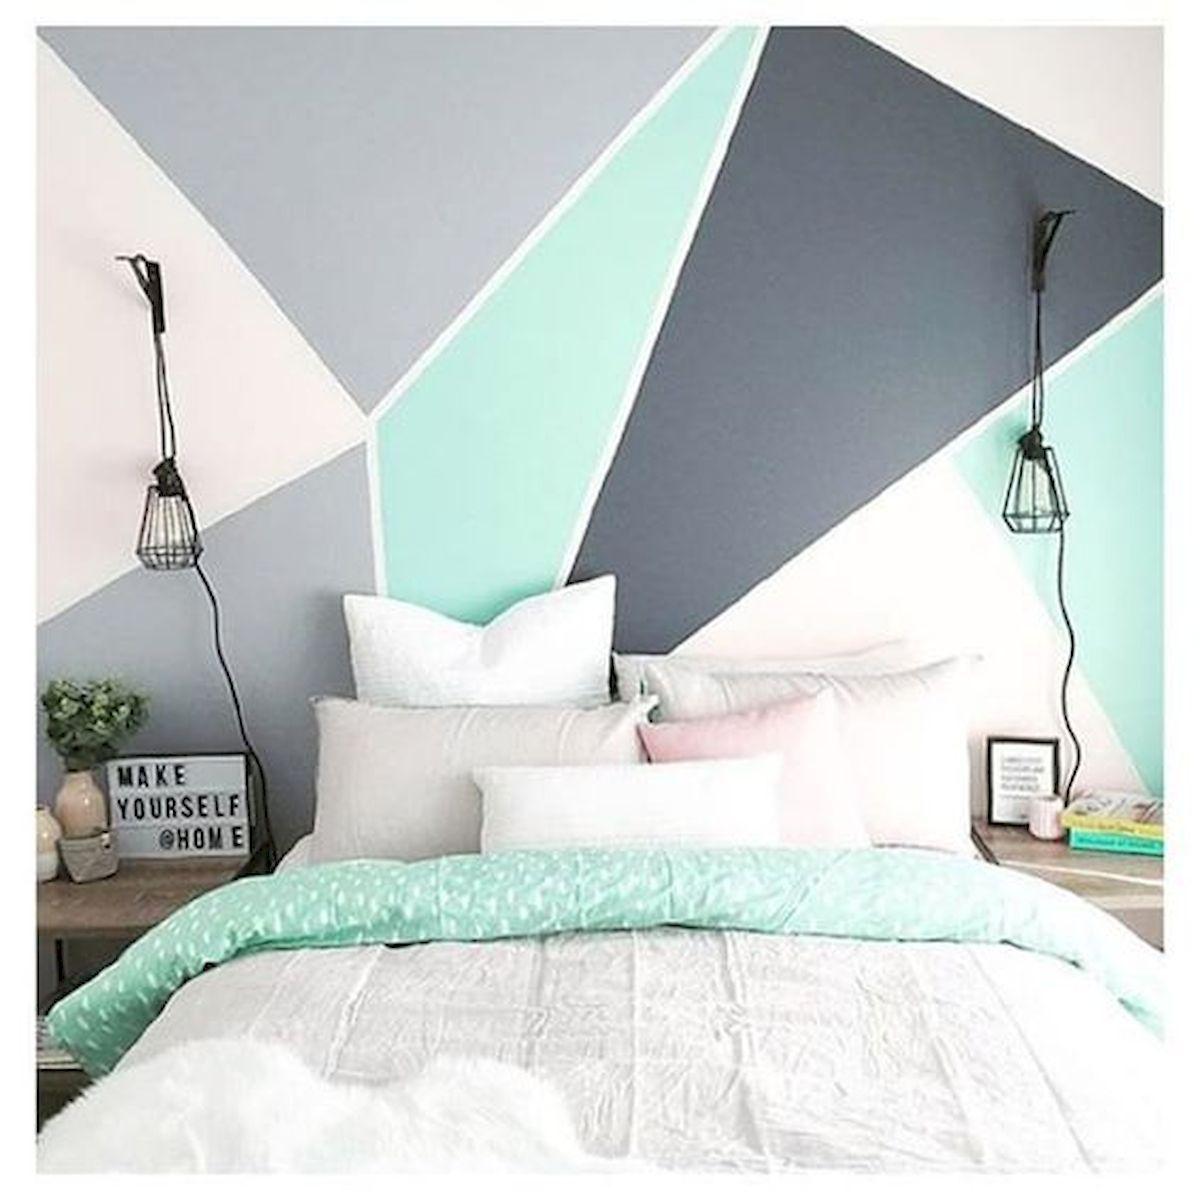 33 Best Geometric Wall Art Paint Design Ideas33DECORart